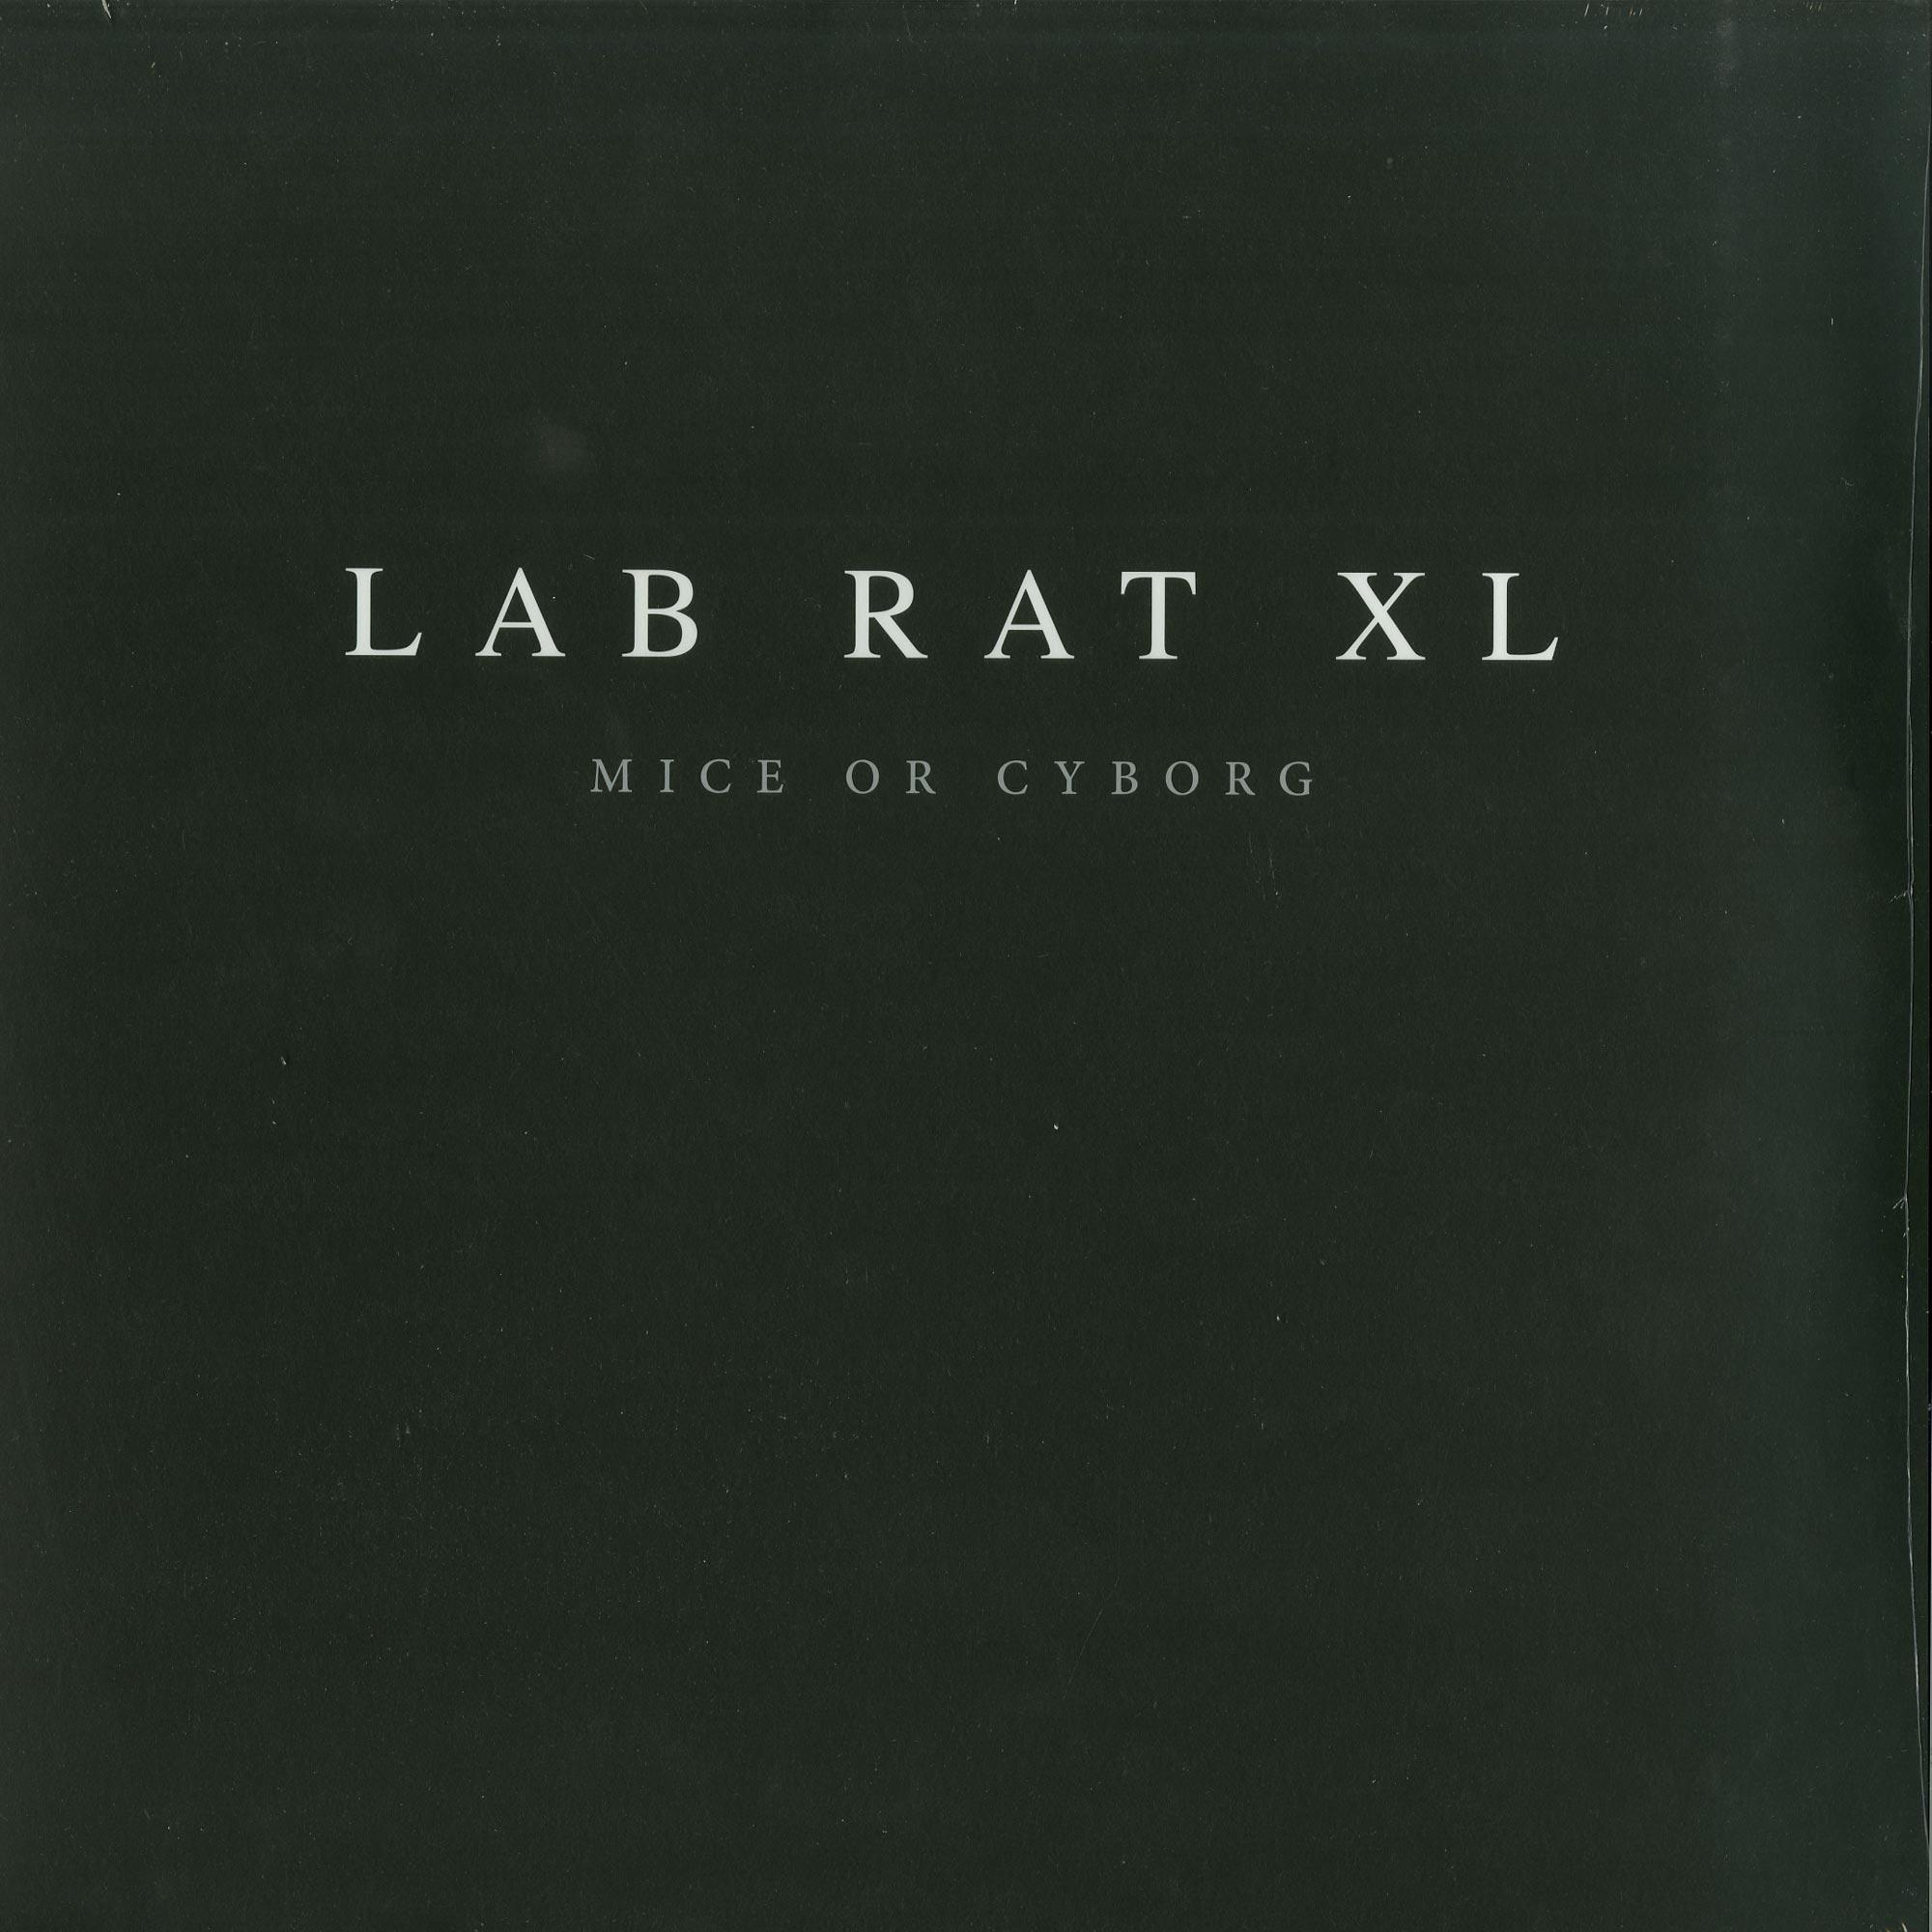 Lab Rats XL  - MICE OR CYBORG